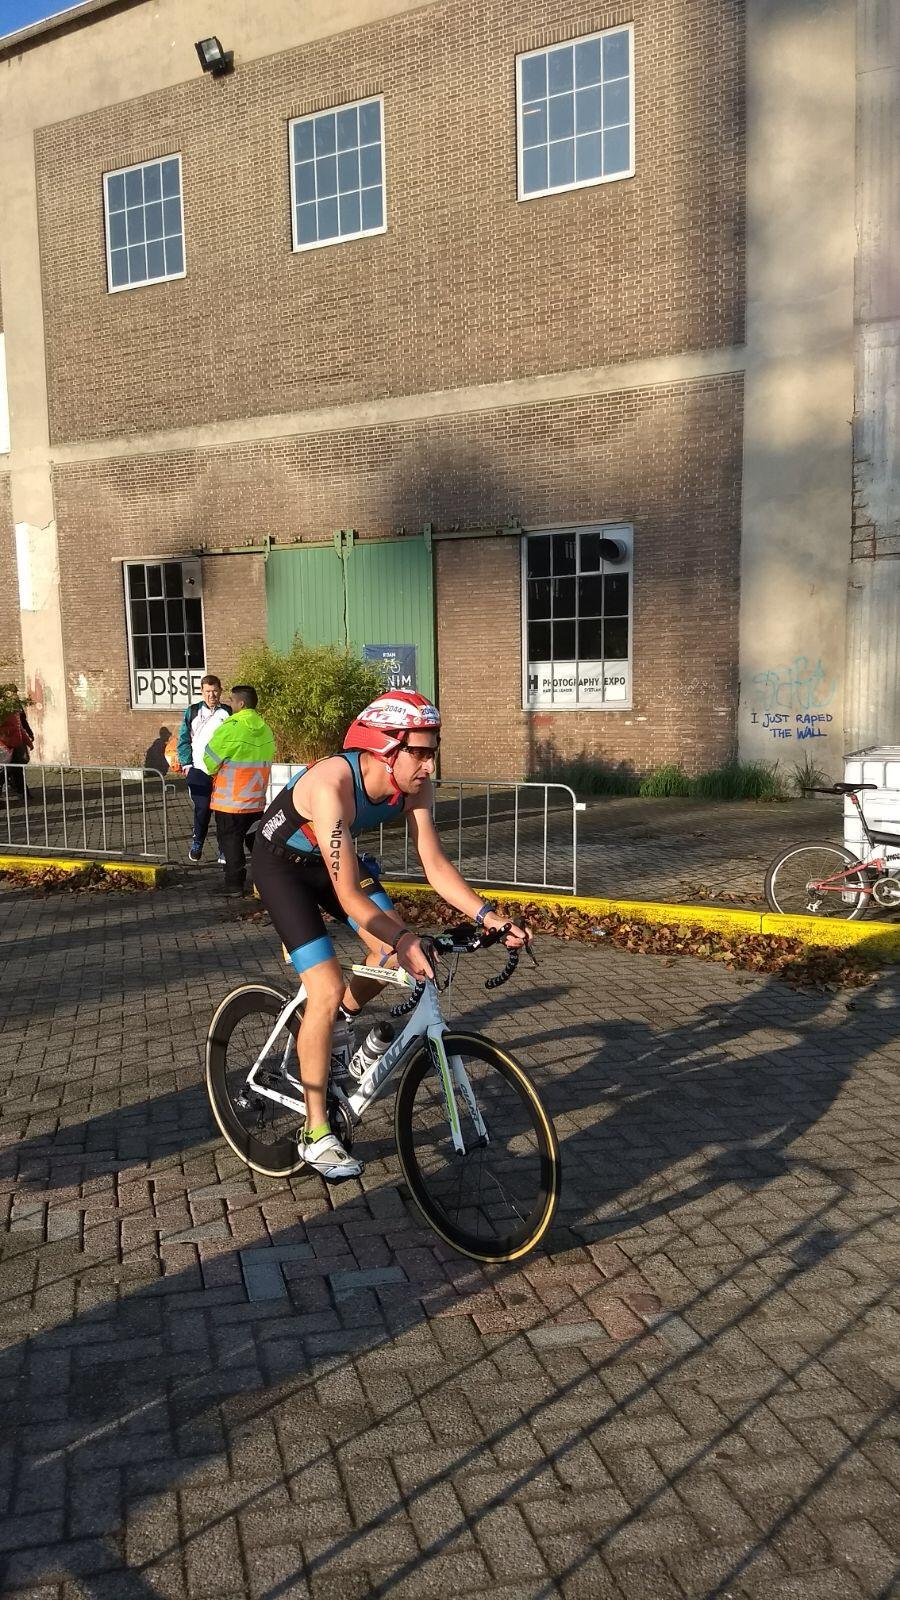 Rotterdam Frederik Van Dijck bike